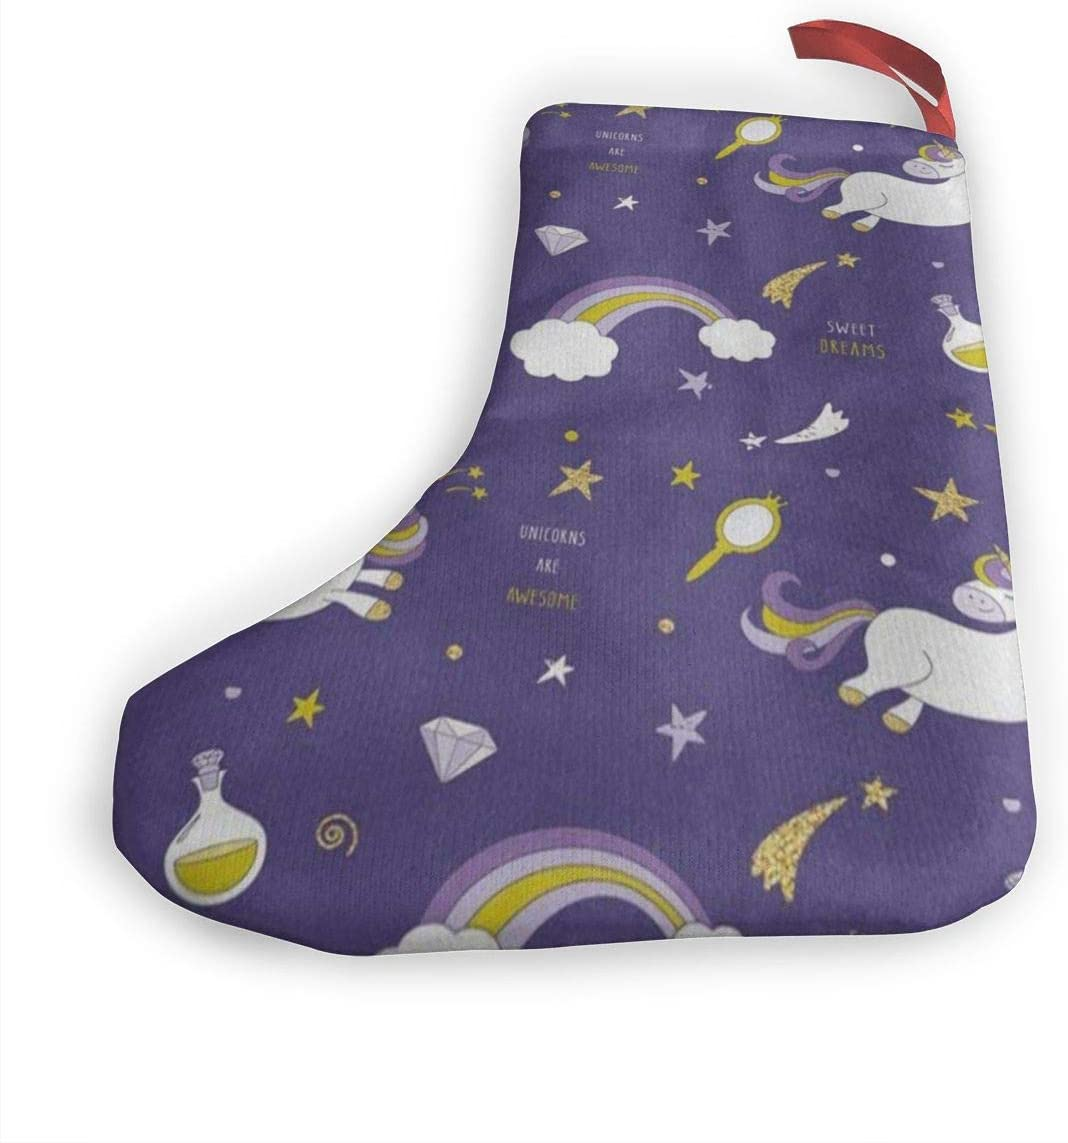 Carolines Treasures Back to School Backpack Ceramic Night Light 6 x 4 1 Purple